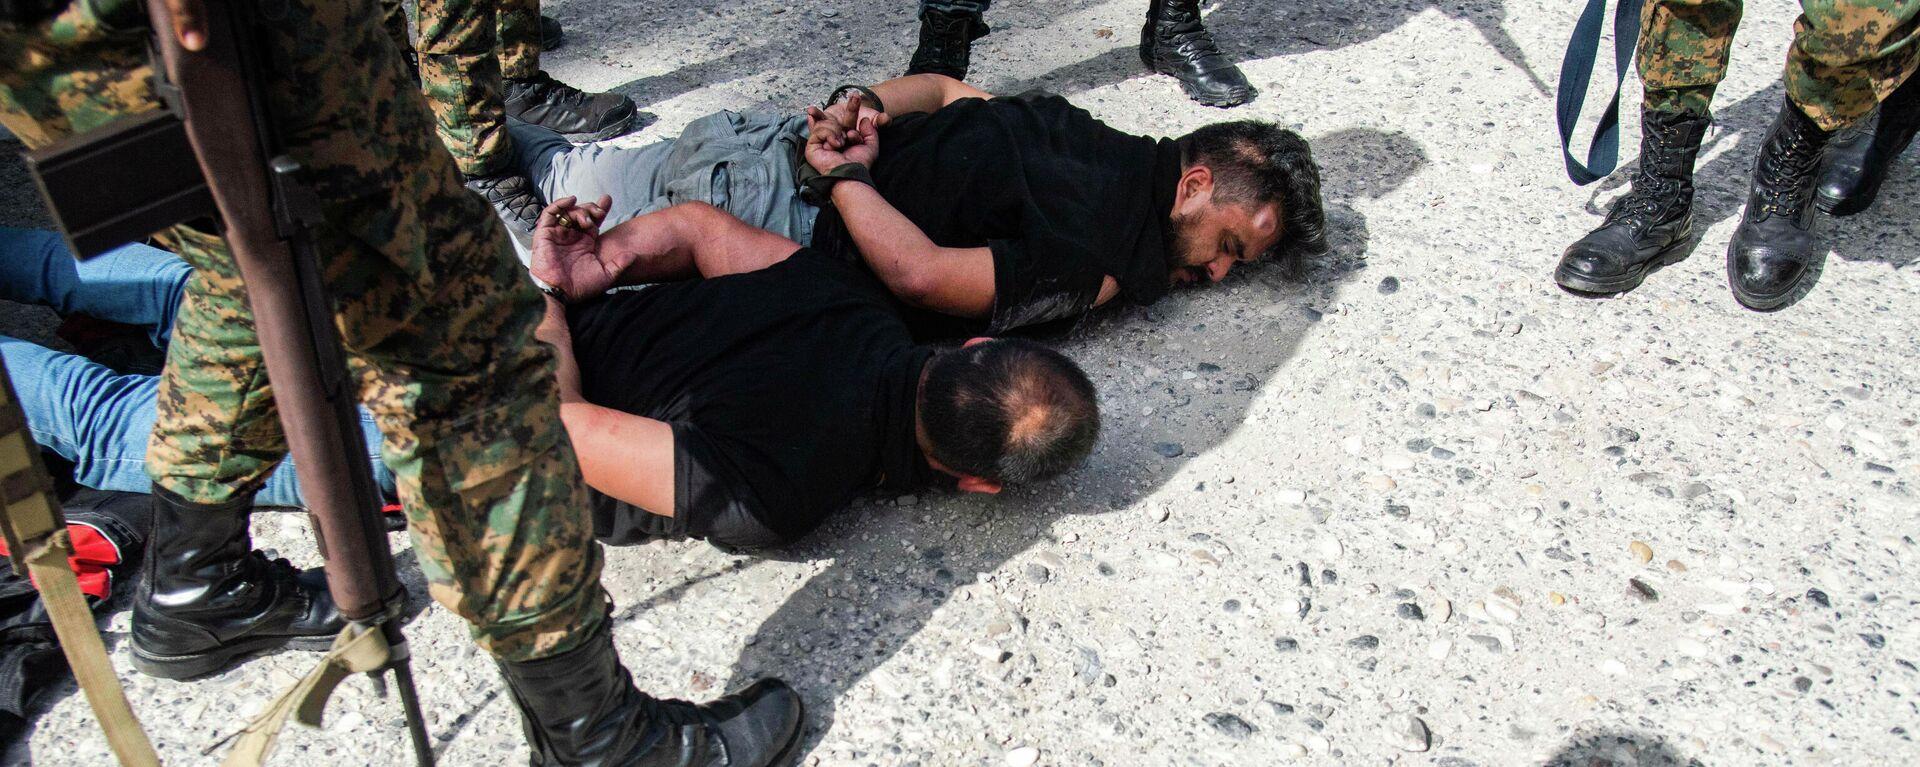 Los detenidos cómplices del asesinato del presidente haitiano, Jovenel Moise - Sputnik Mundo, 1920, 19.08.2021